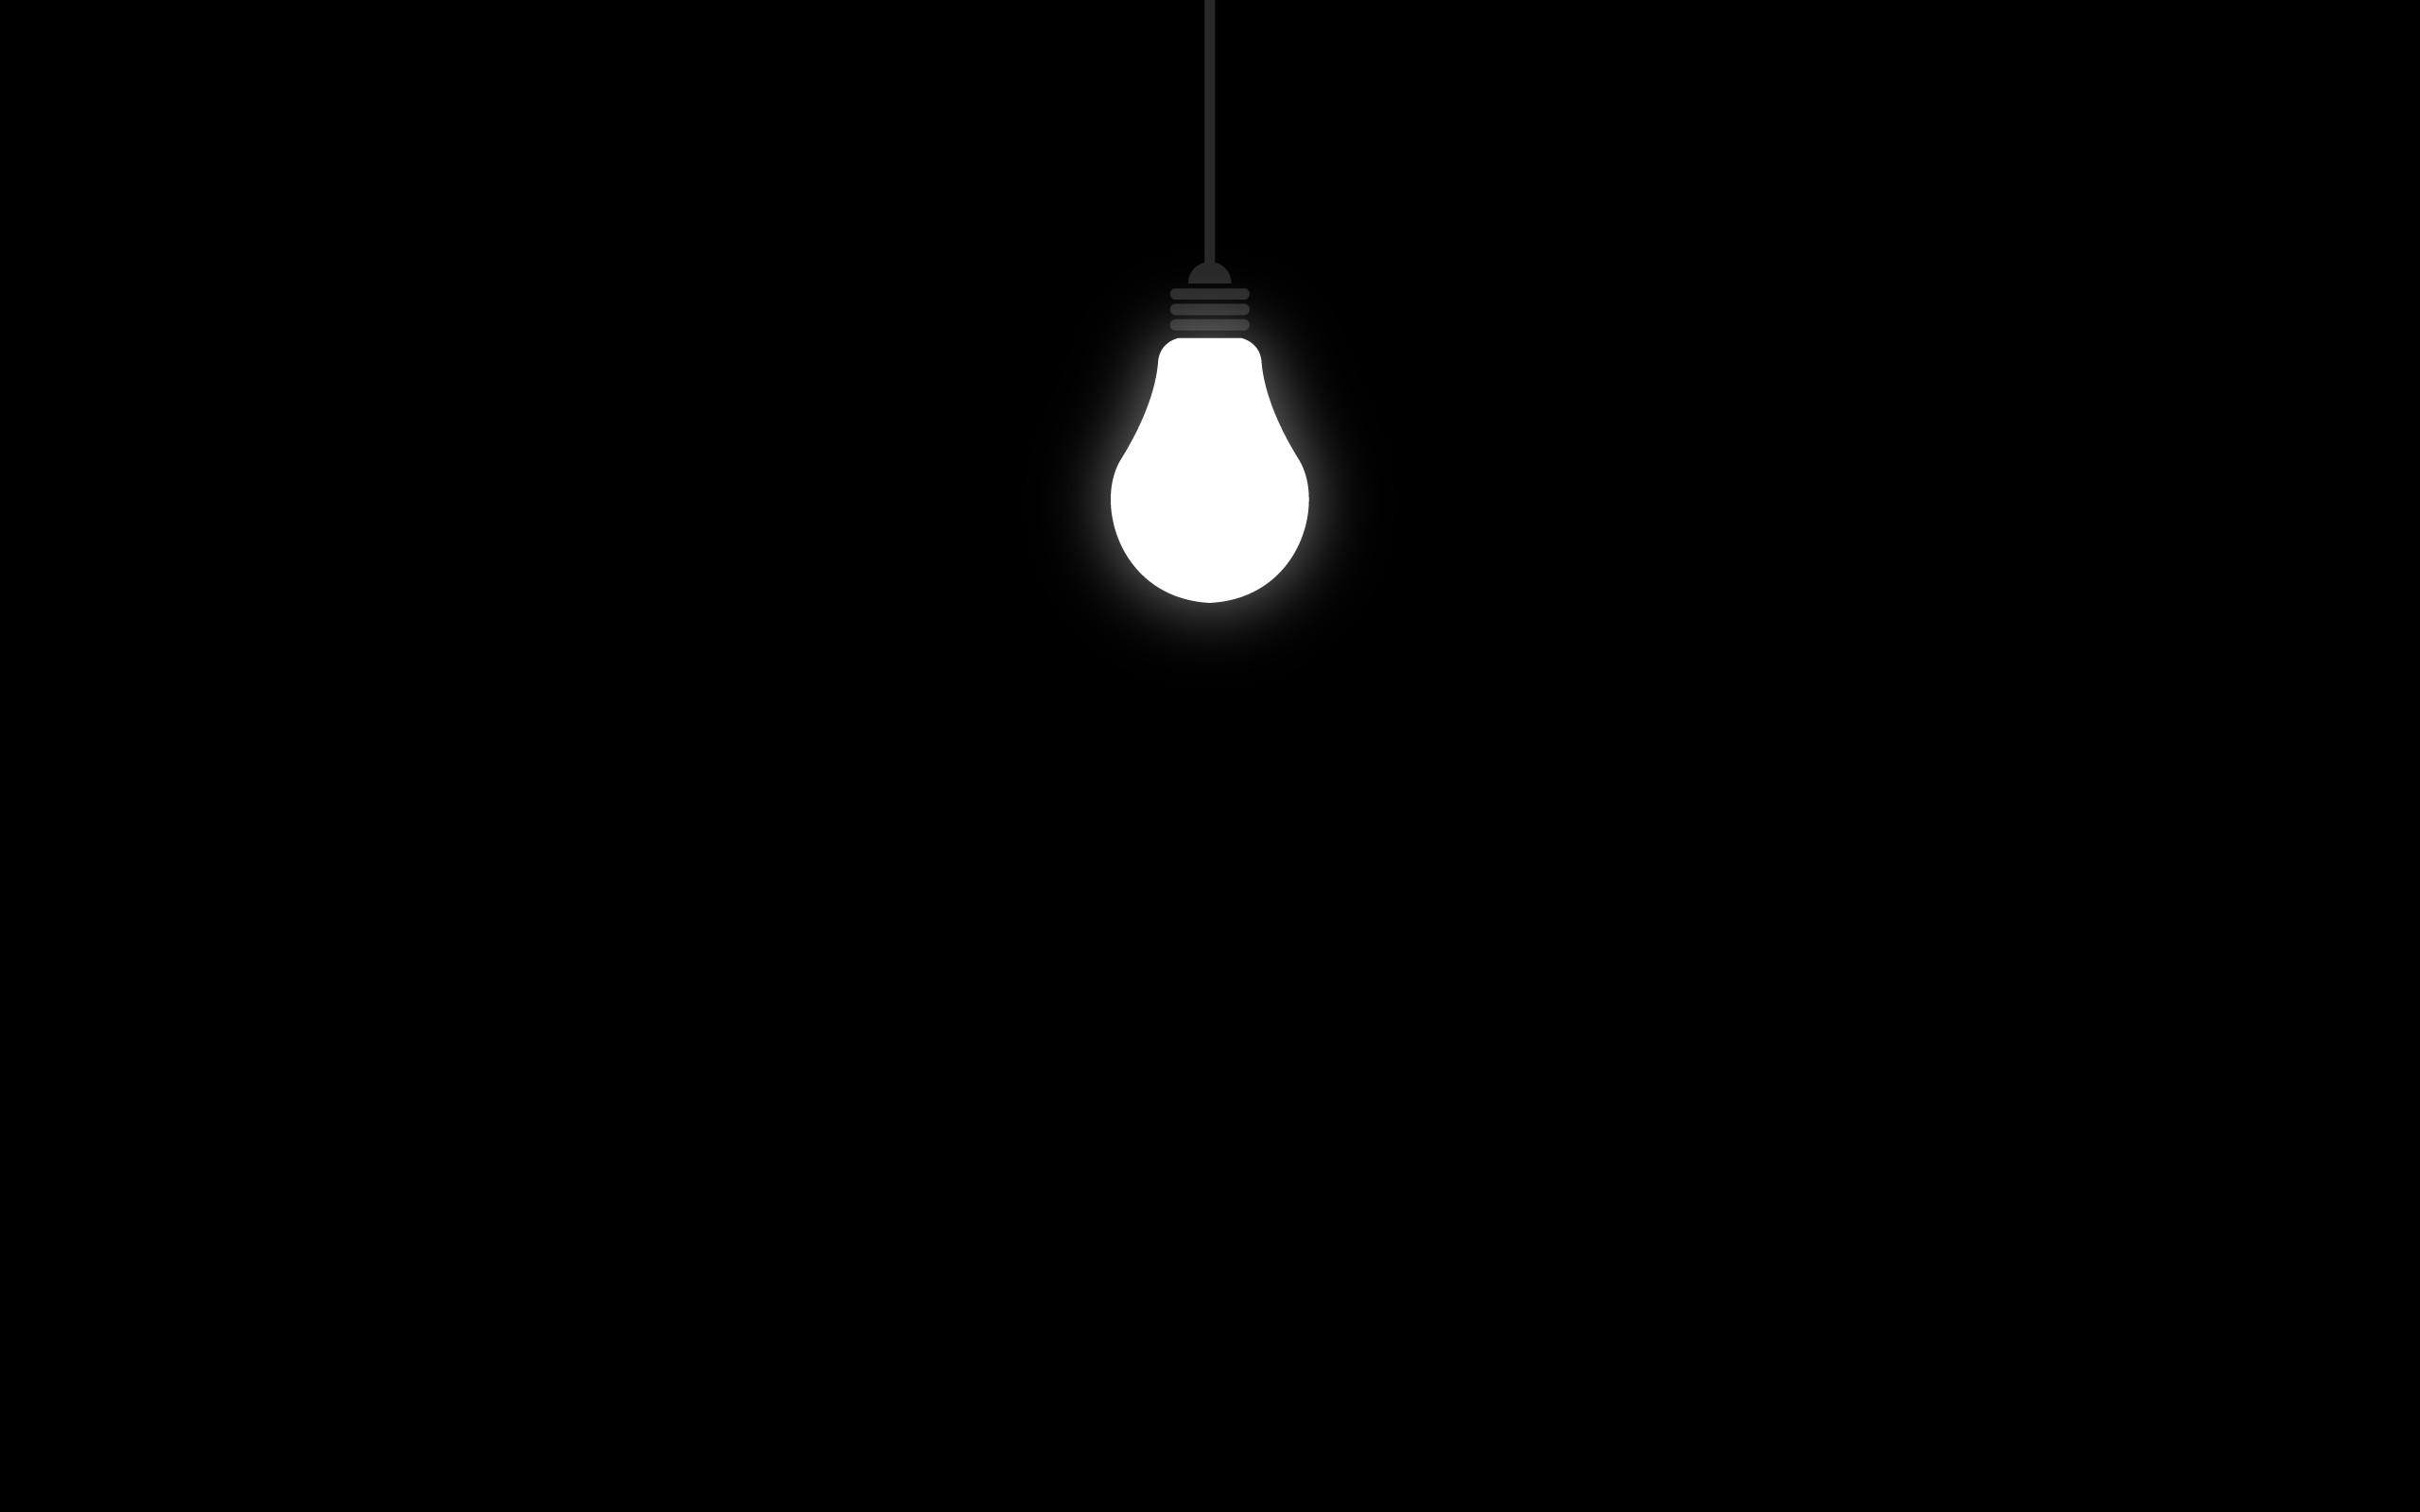 Best 25+ Black desktop background ideas on Pinterest   Black canvas, Deer  head silhouette and Flat lay